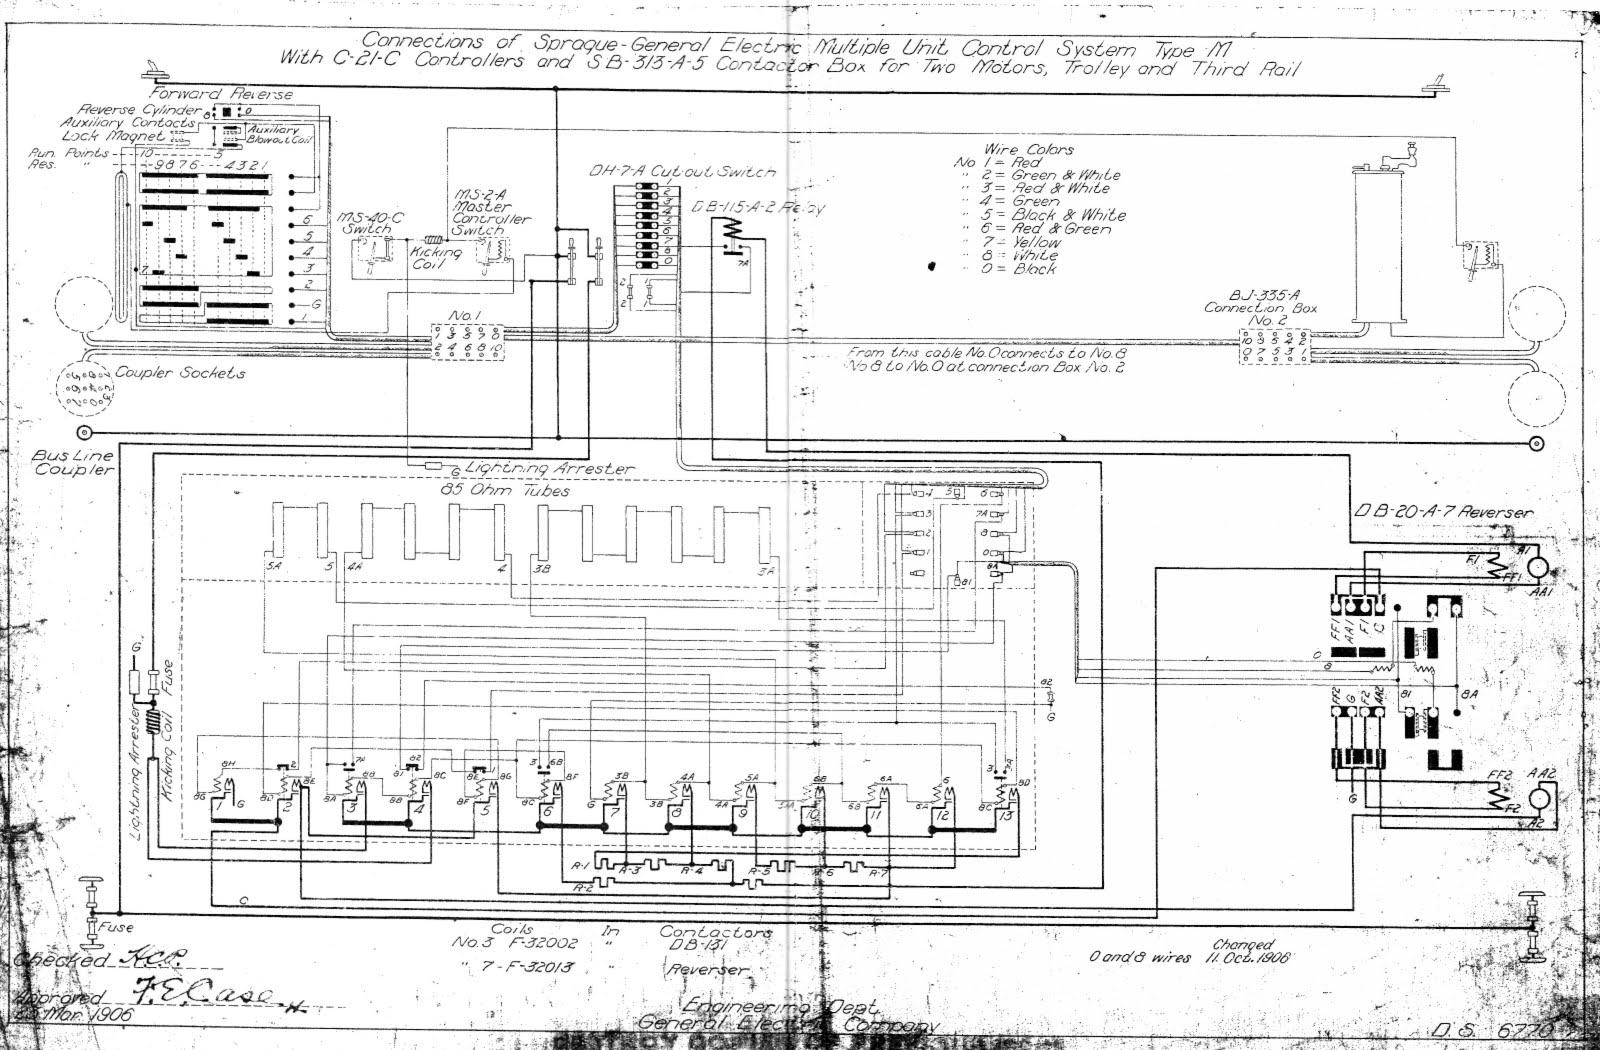 medium resolution of skoda citigo wiring diagram wiring schematic diagram www guenstige entruempelung berlin de